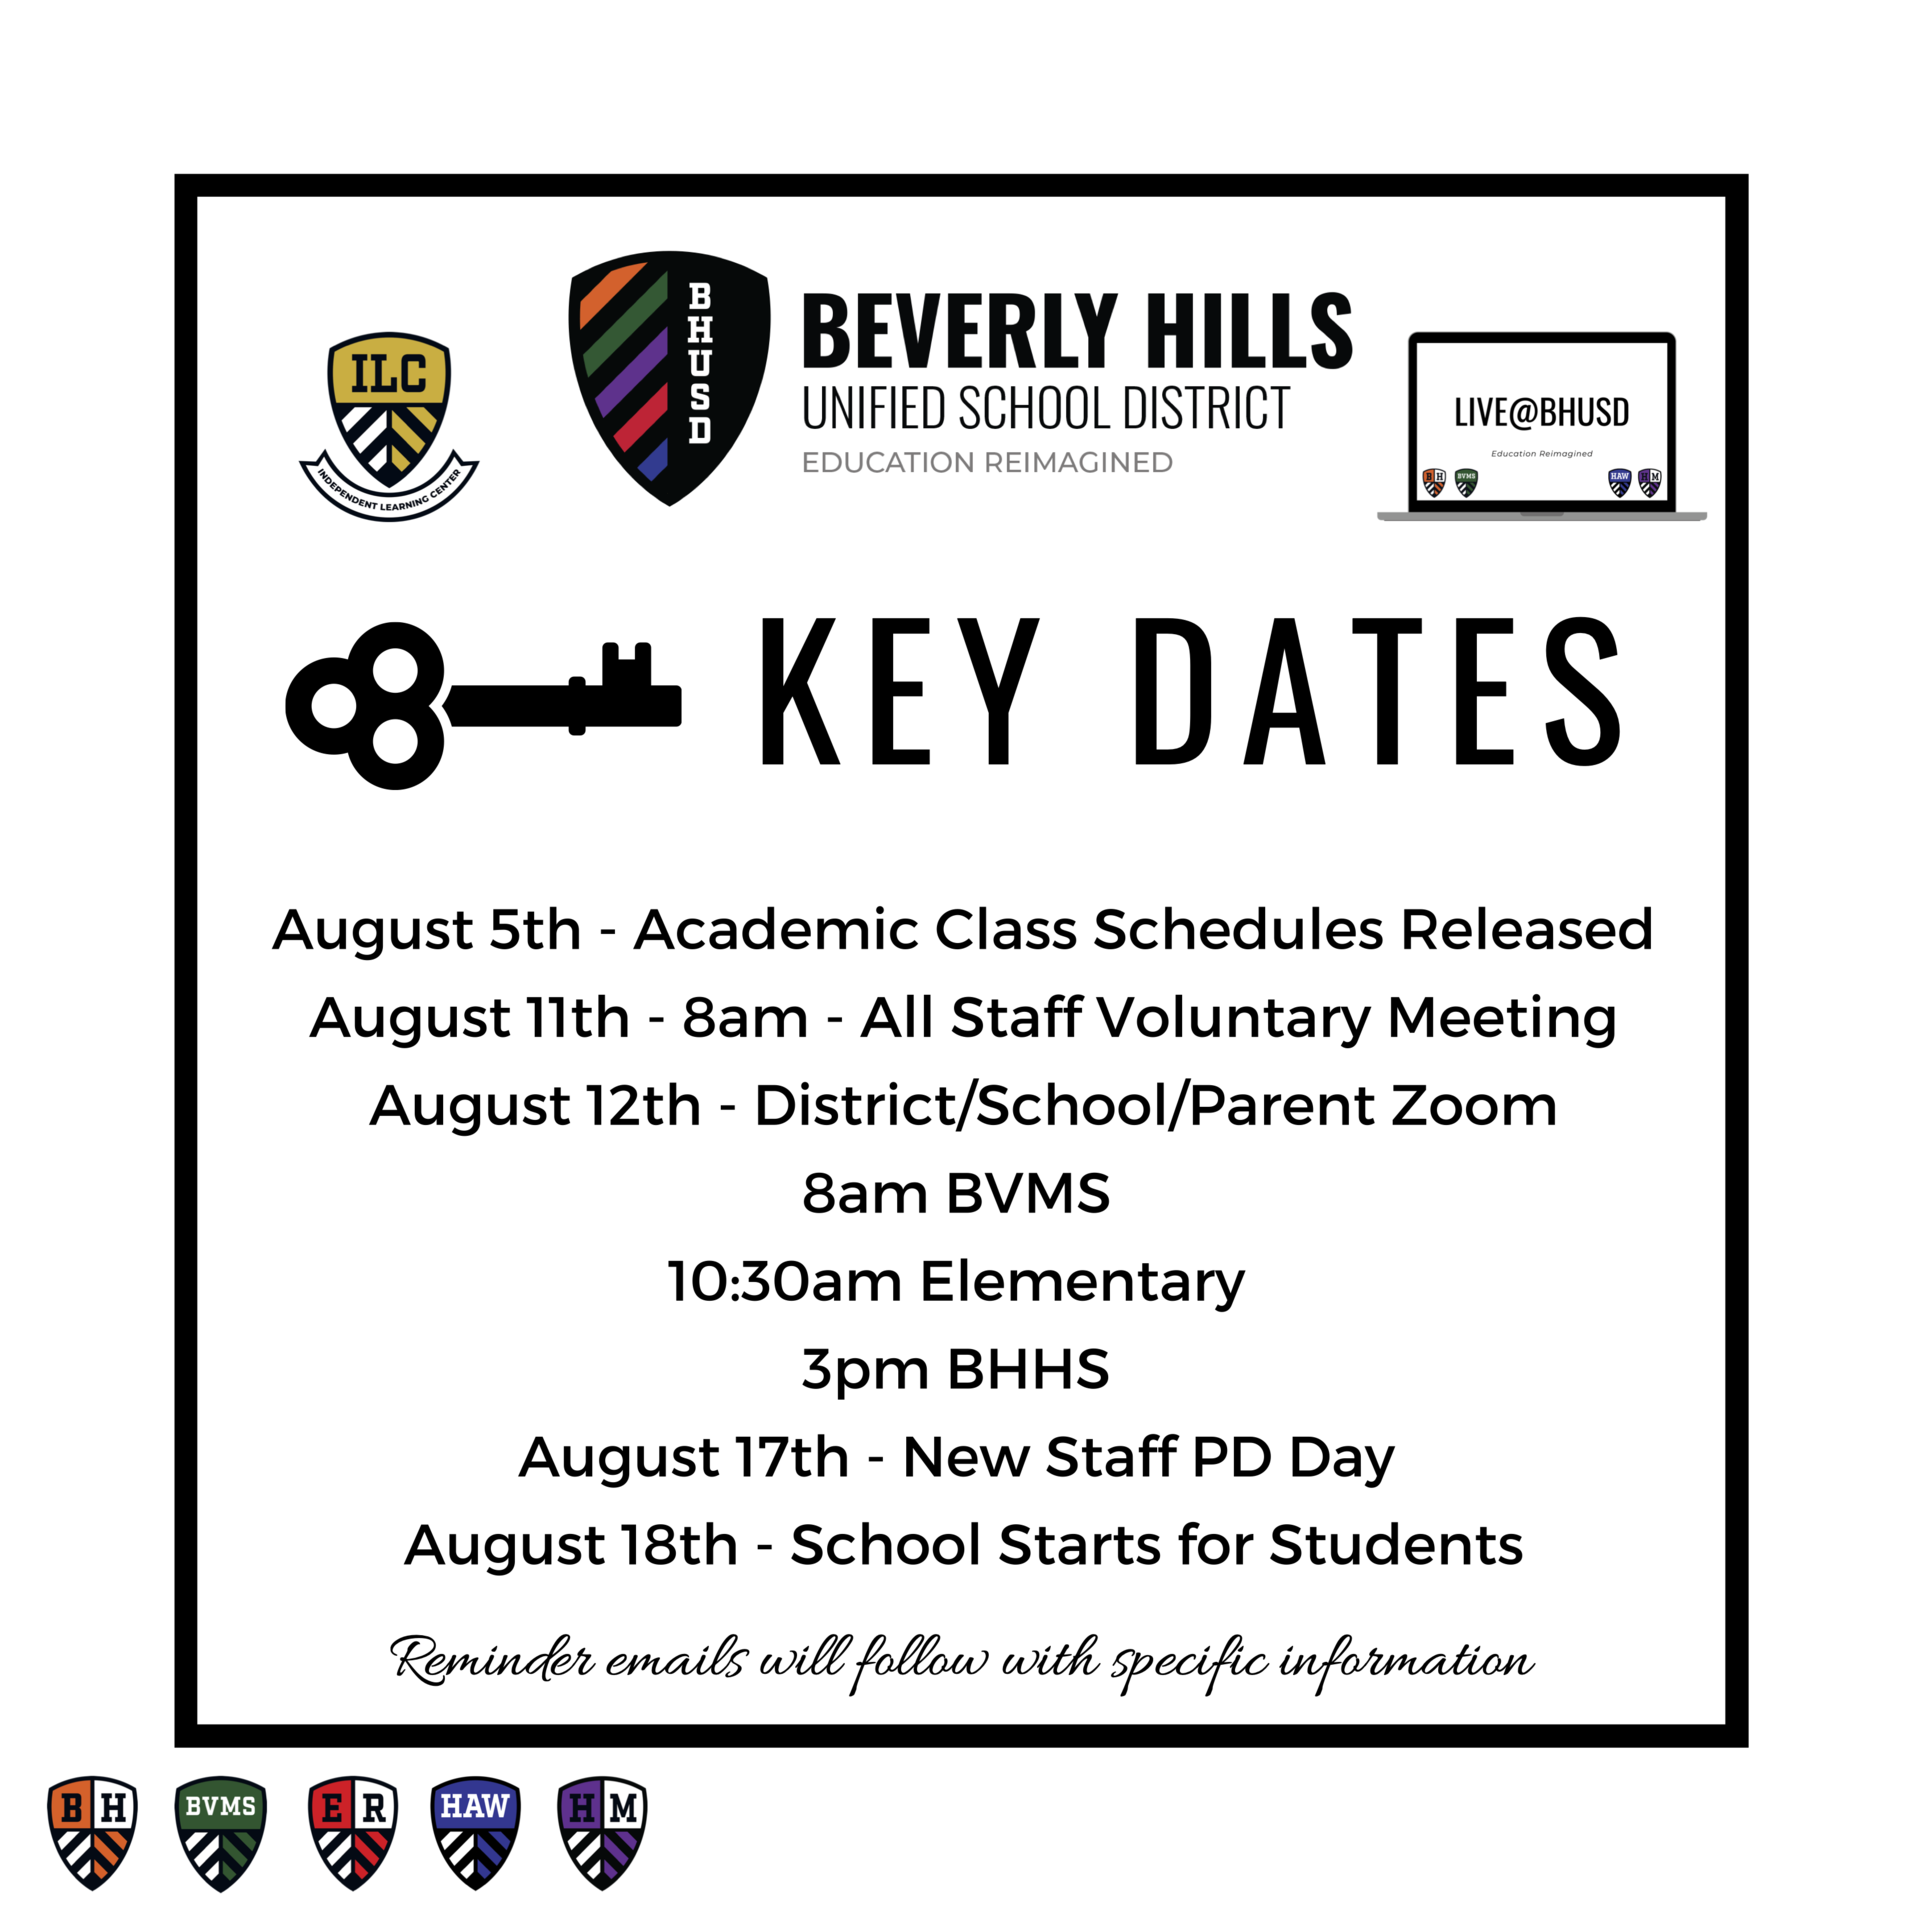 Key Dates August